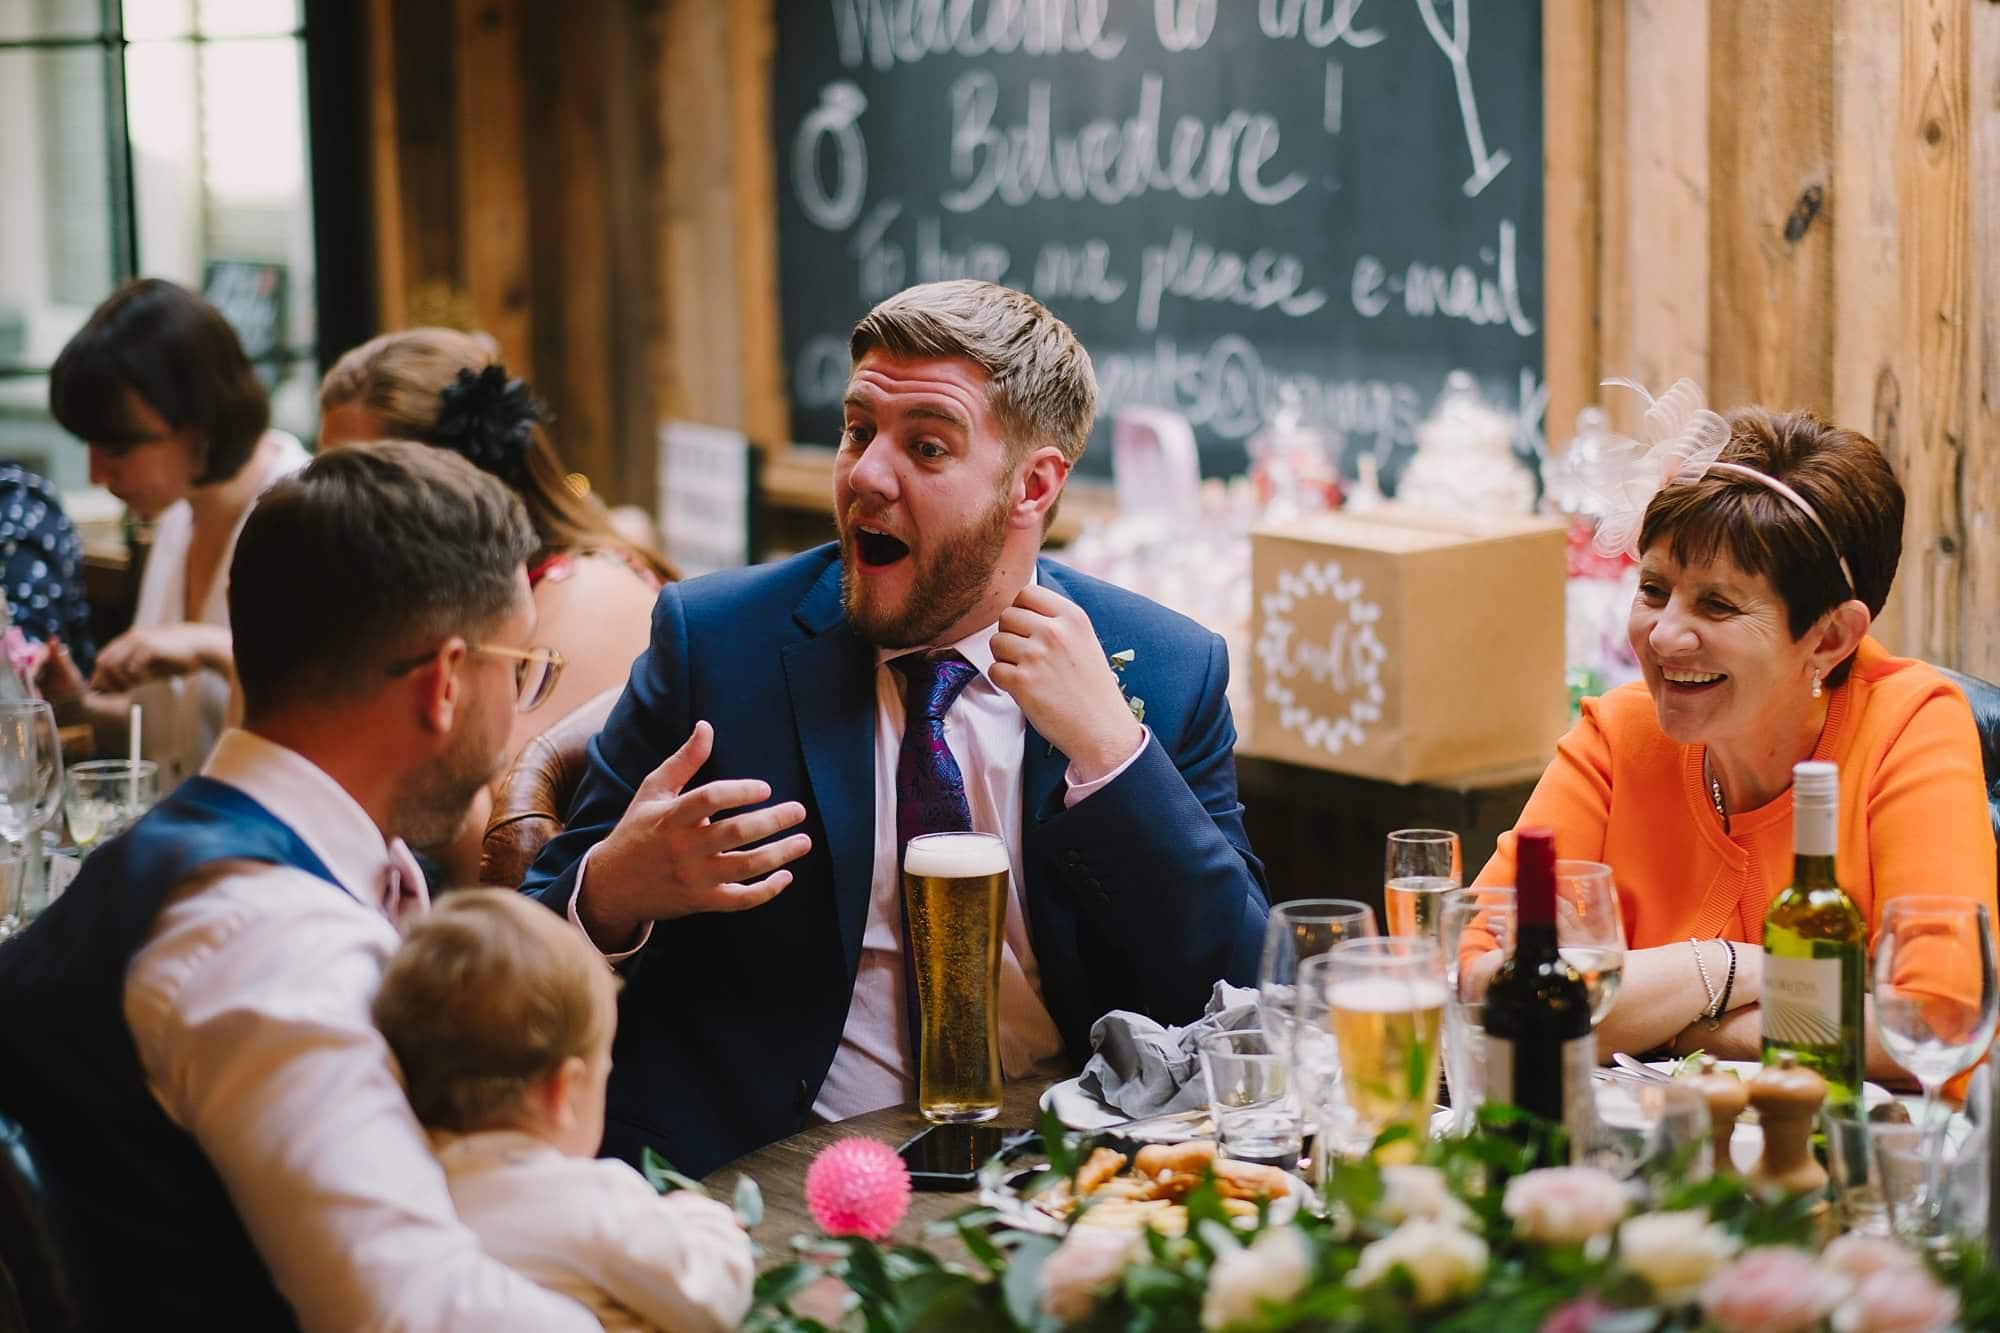 london pub wedding photographer jn 035 - The County Arms Wedding Photographer   Jen & Nick